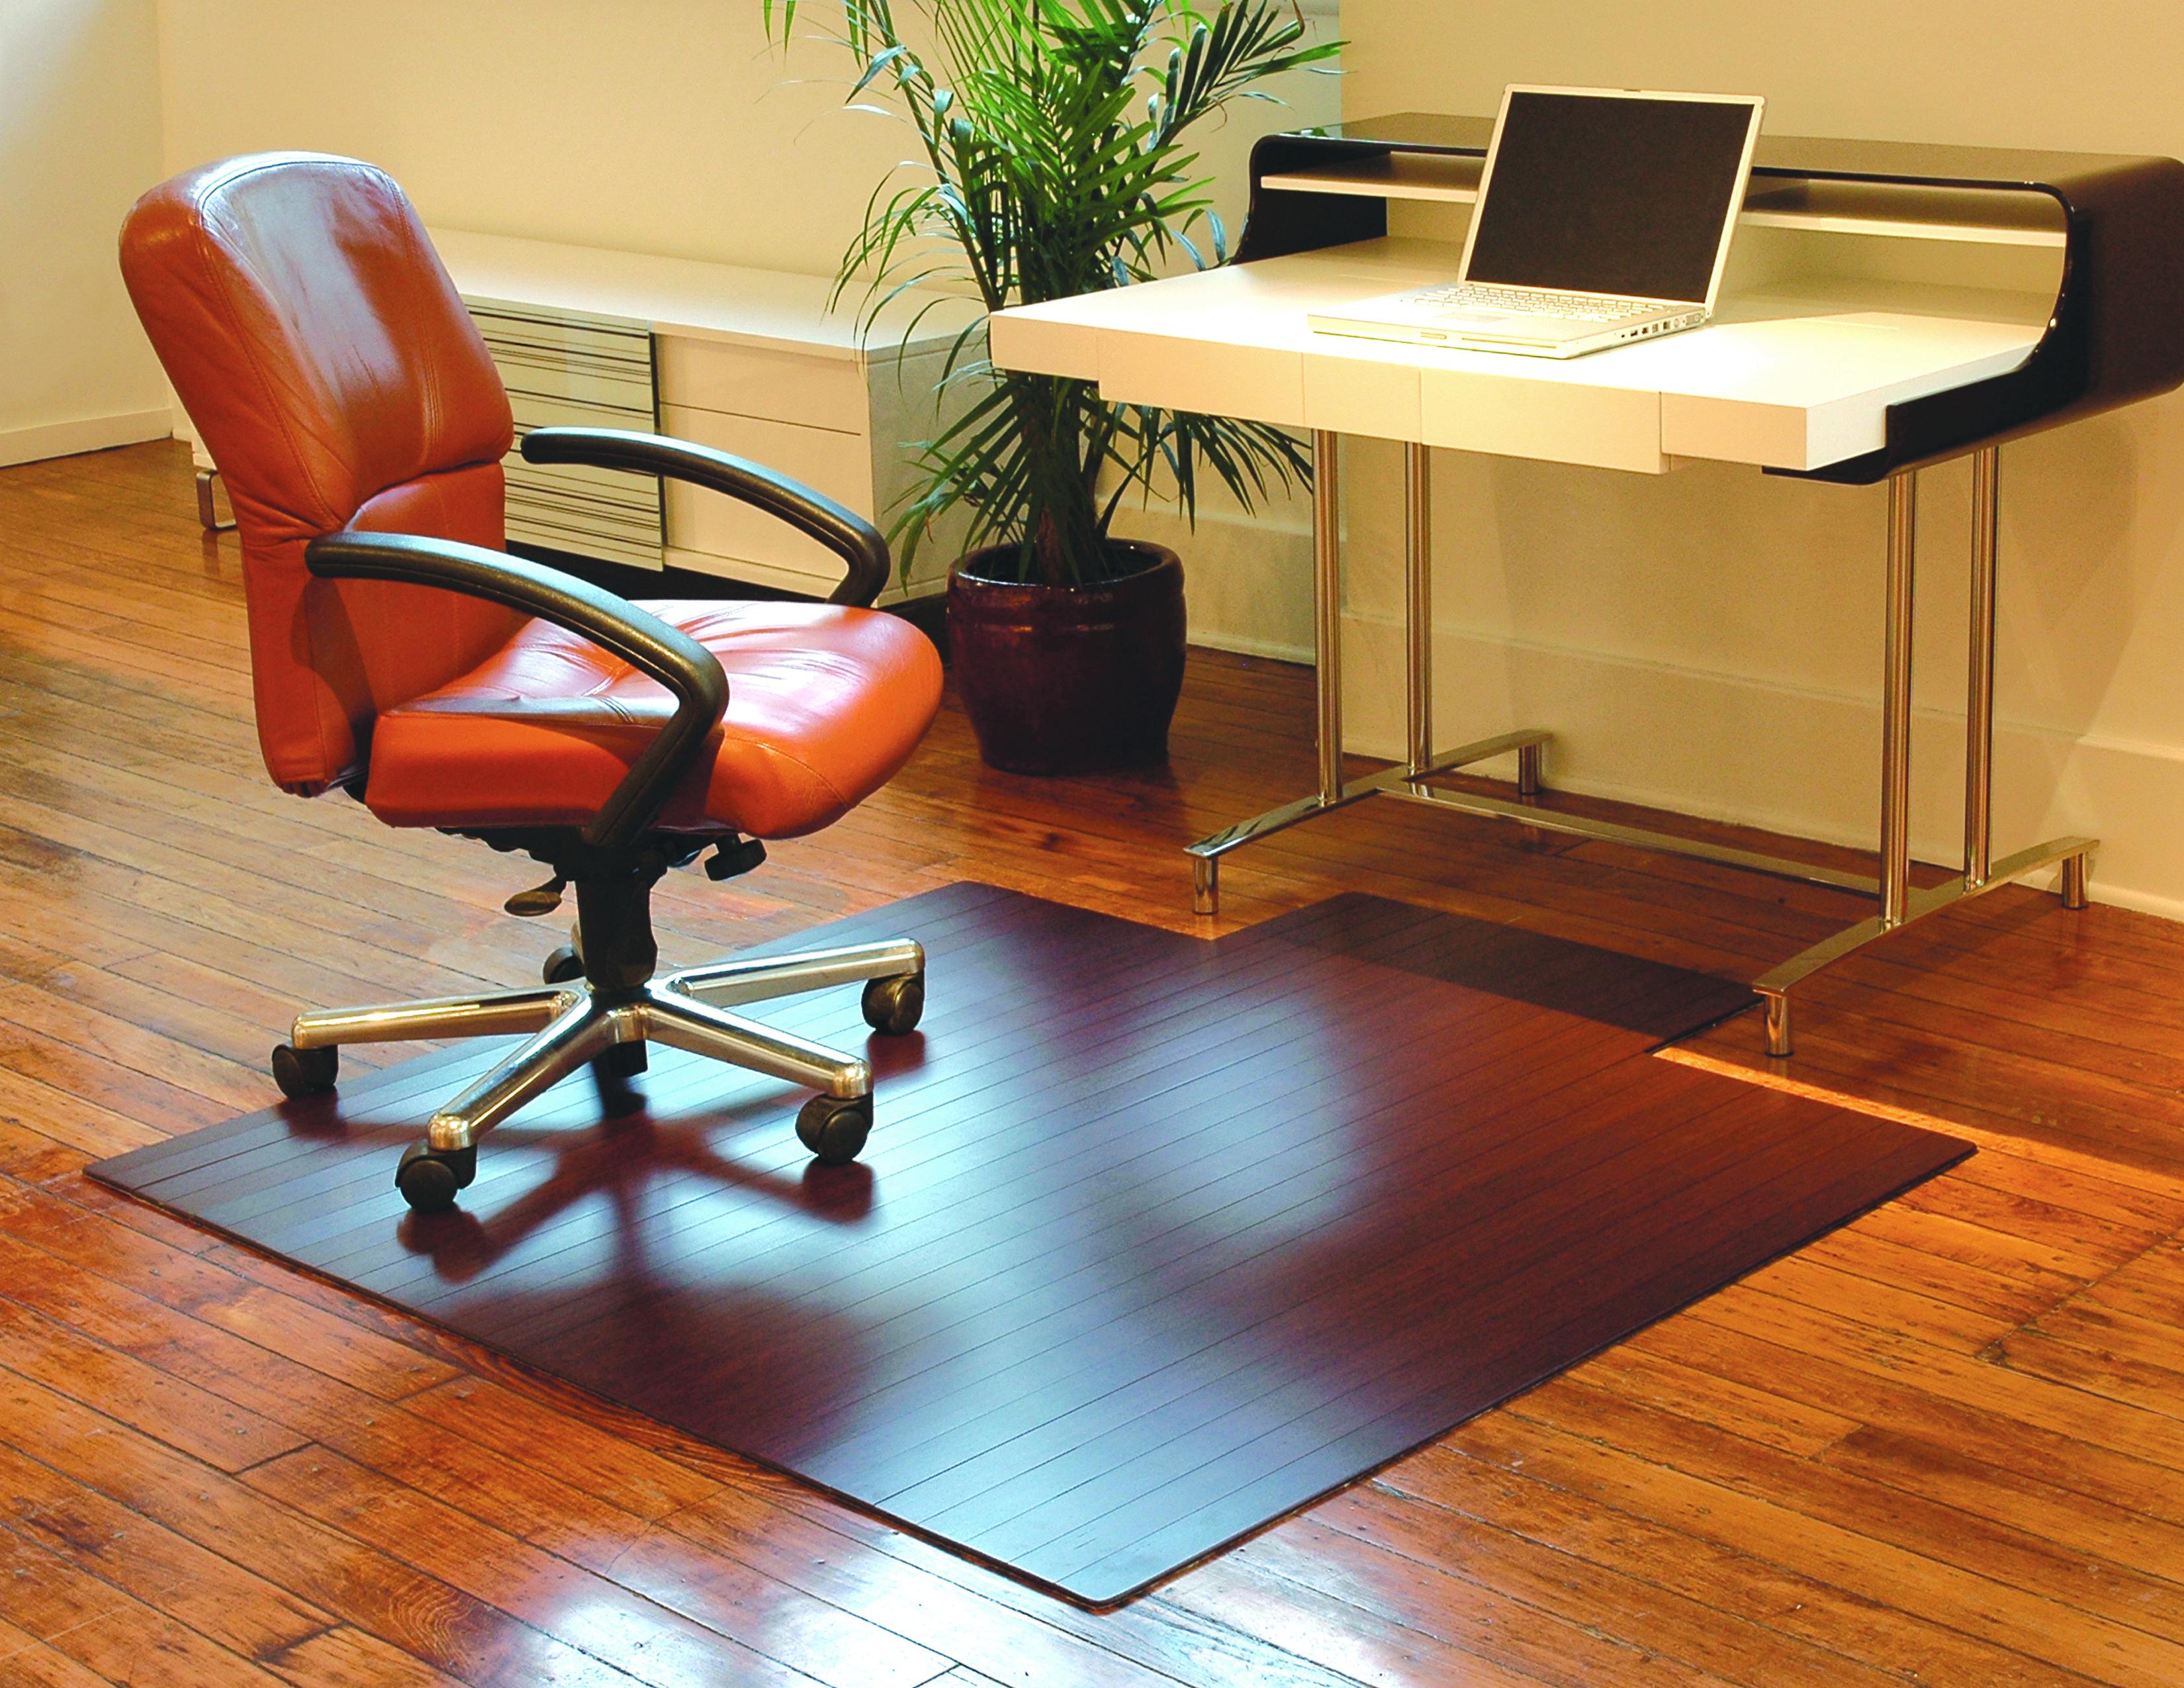 Dark Cherry Bamboo Rollup Chairmats 8mm